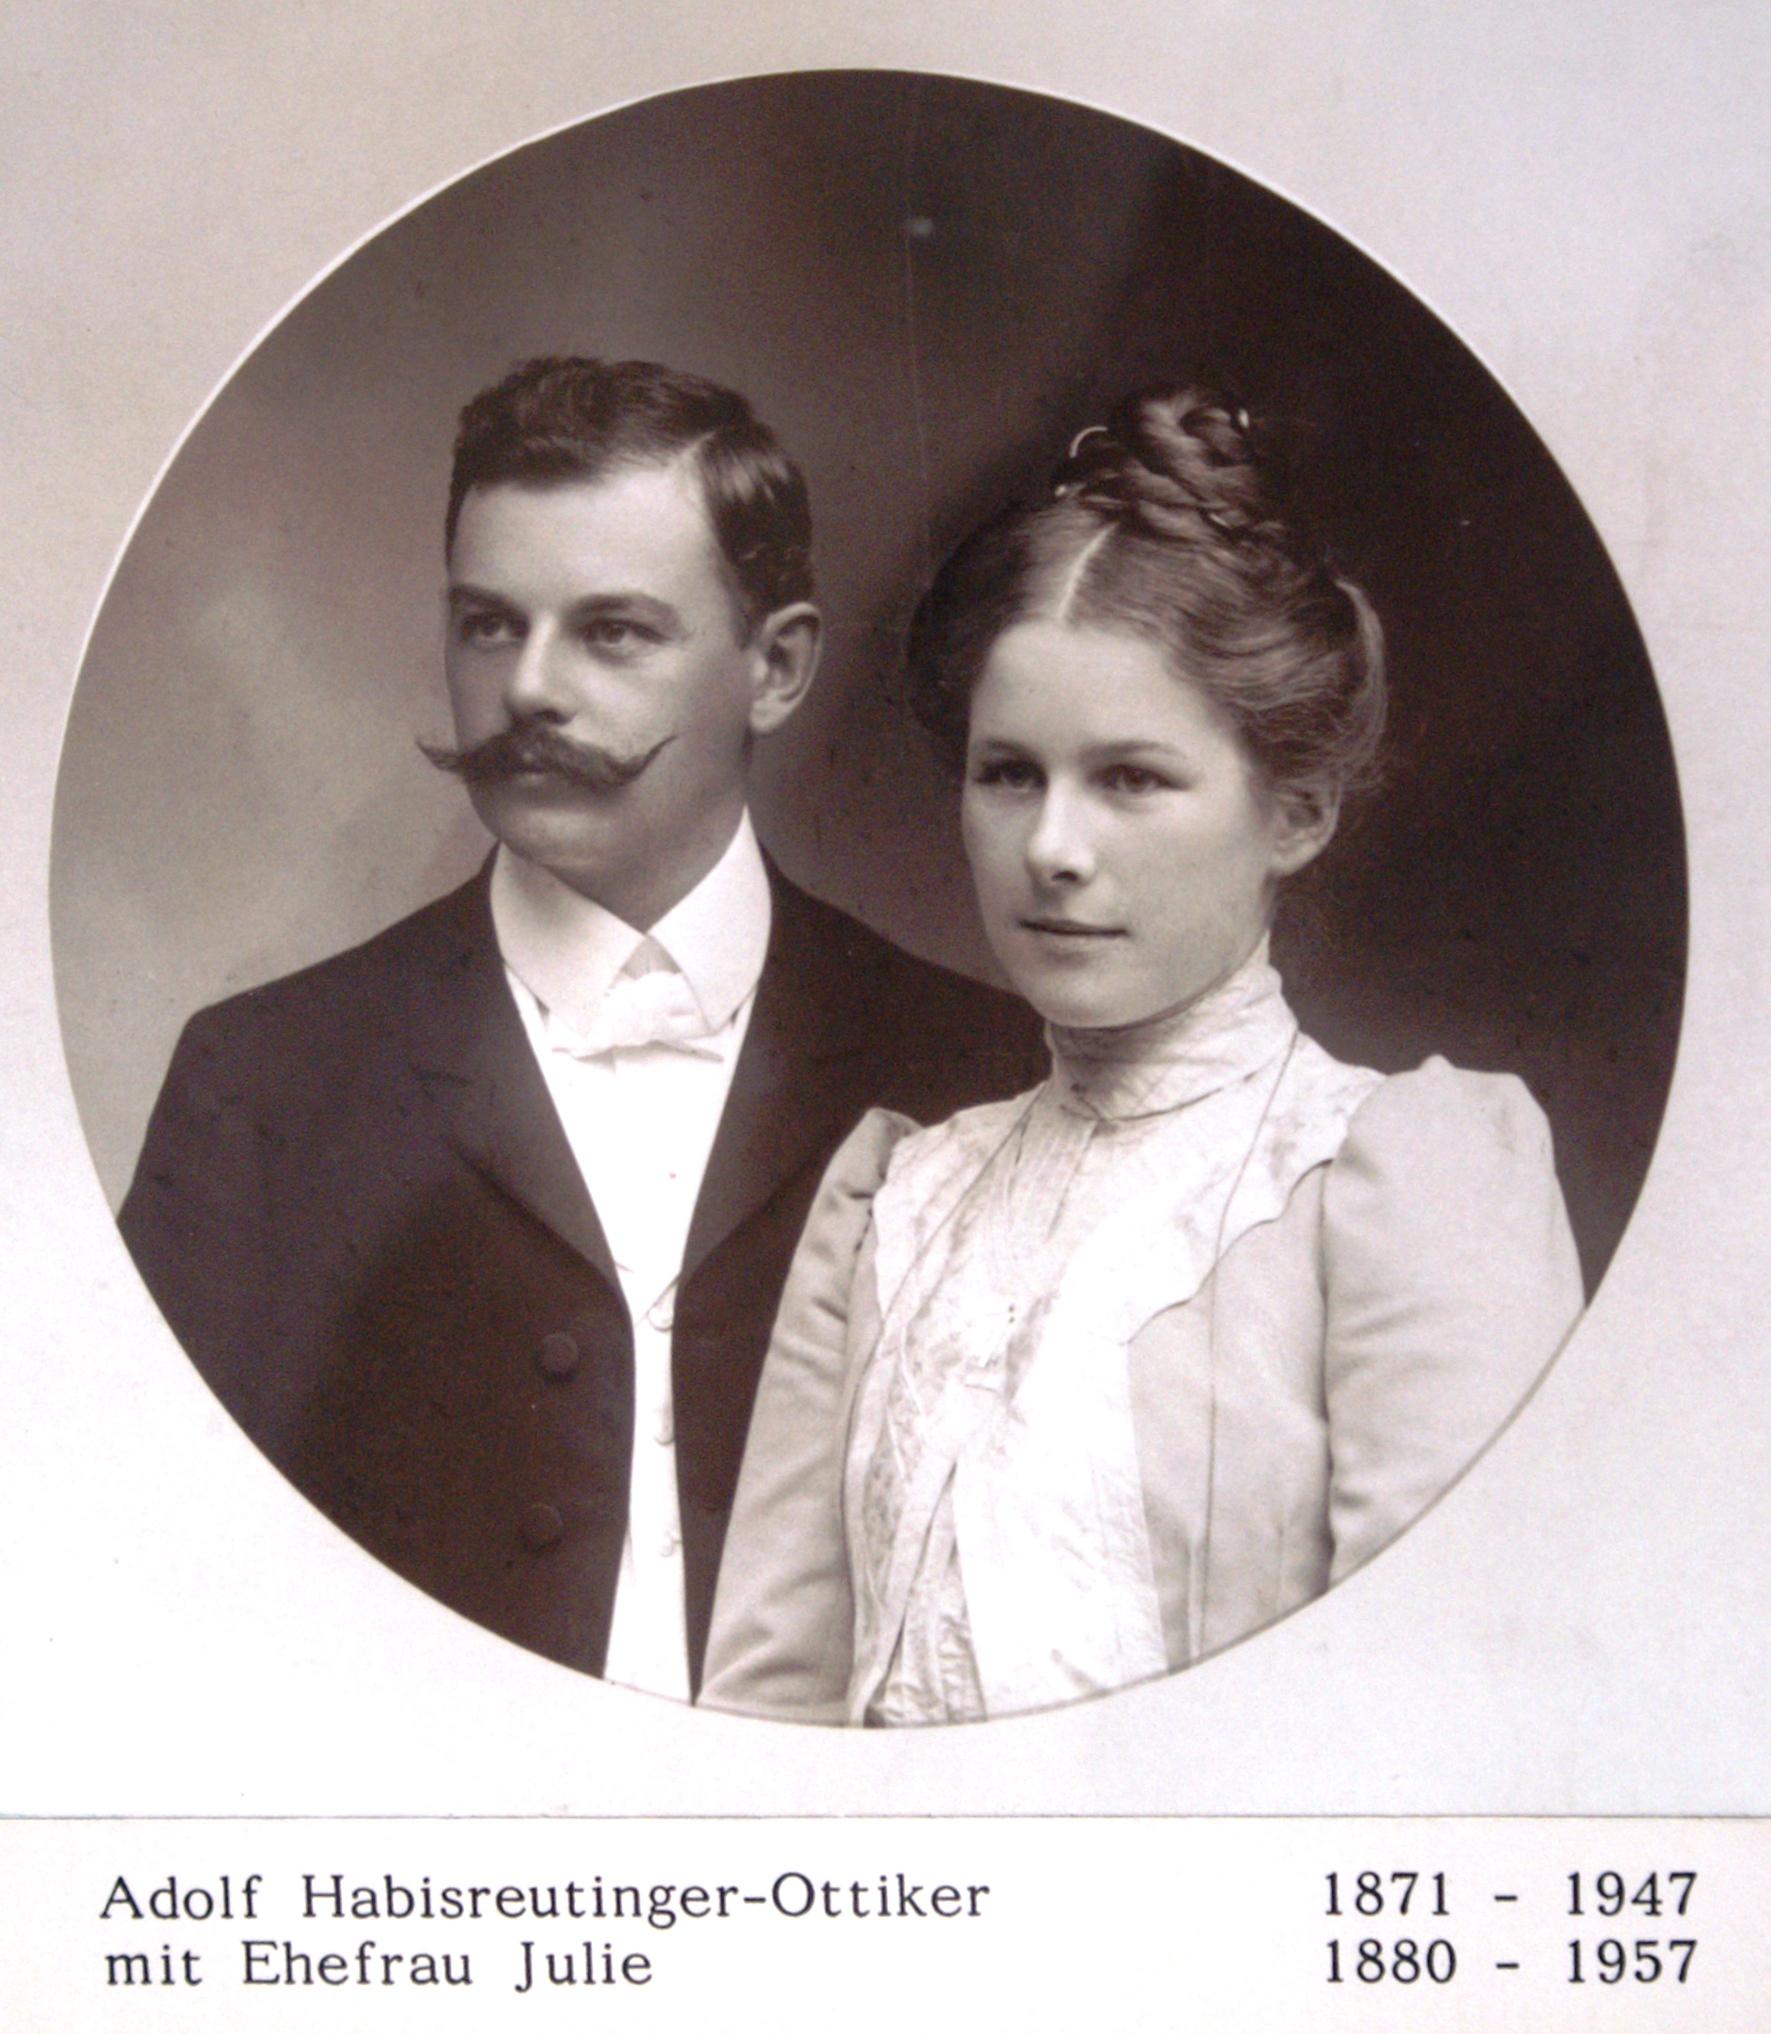 Ehepaar Habisreutinger-Ottiker, nachfolgende Bewohner im Lindengut